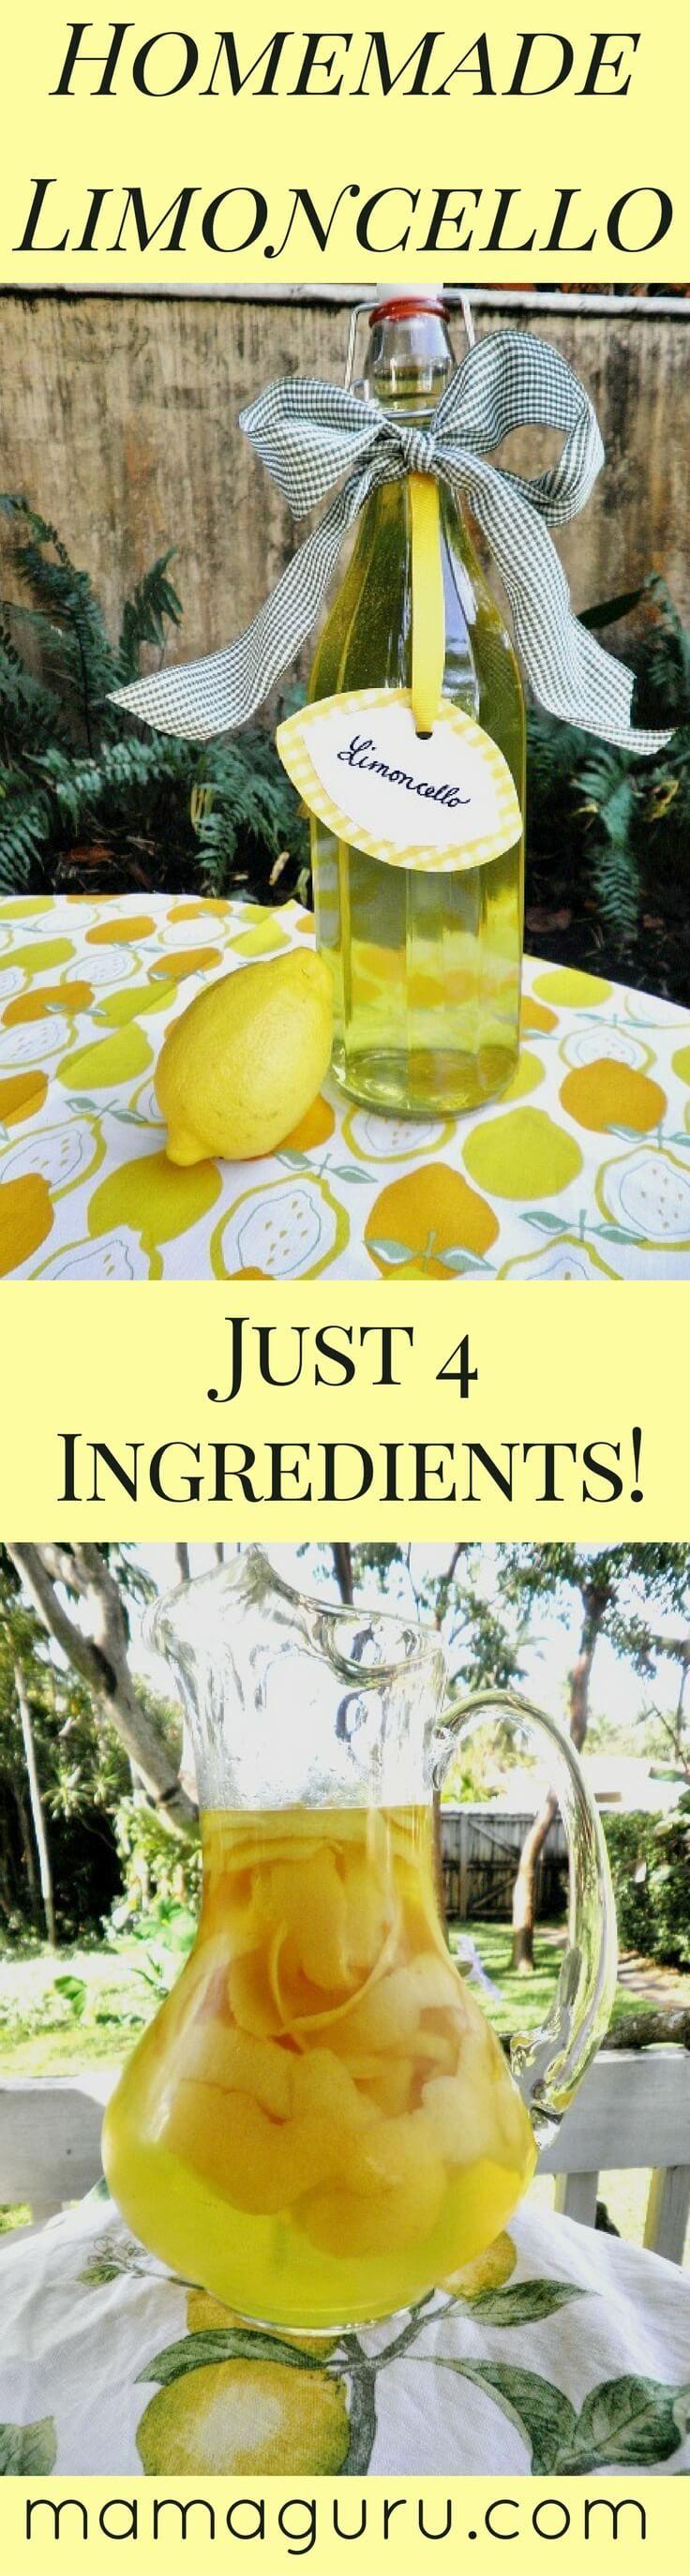 Authentic Italian Recipe for Limoncello • Mamaguru #homemadechristmasgifts